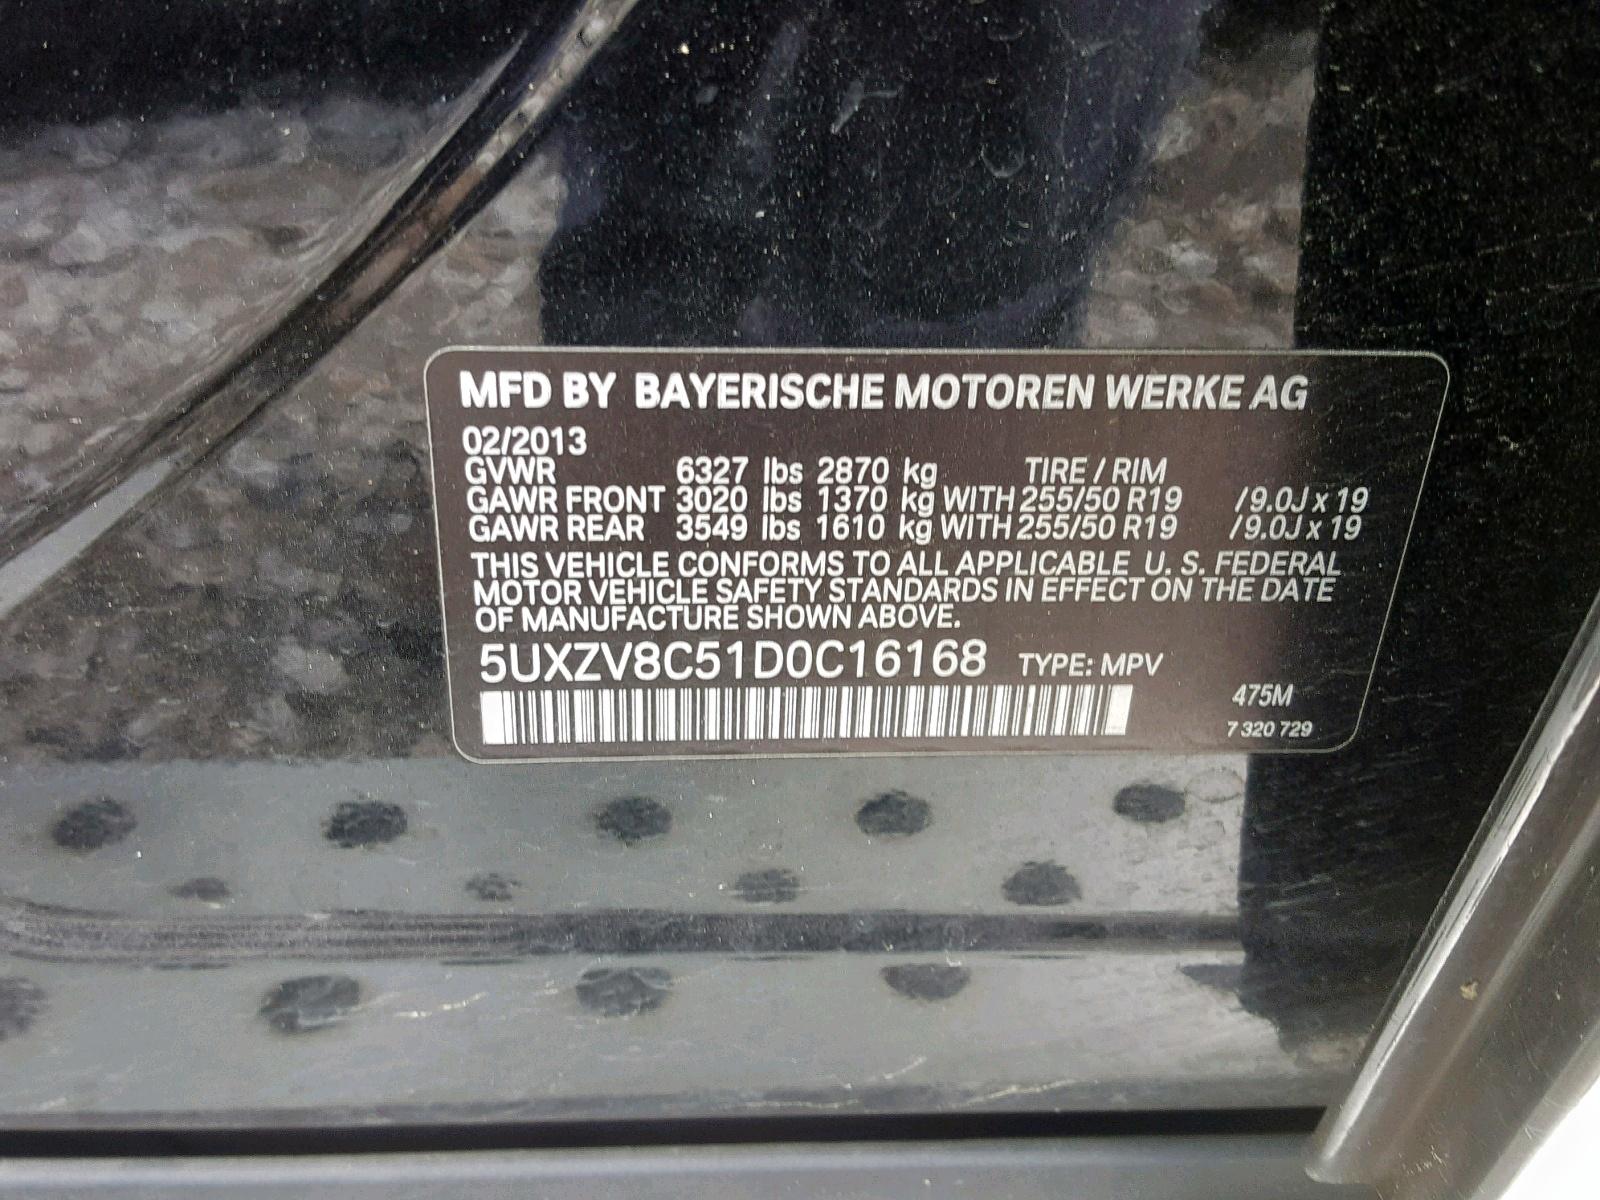 5UXZV8C51D0C16168 - 2013 Bmw X5 Xdrive5 4.4L